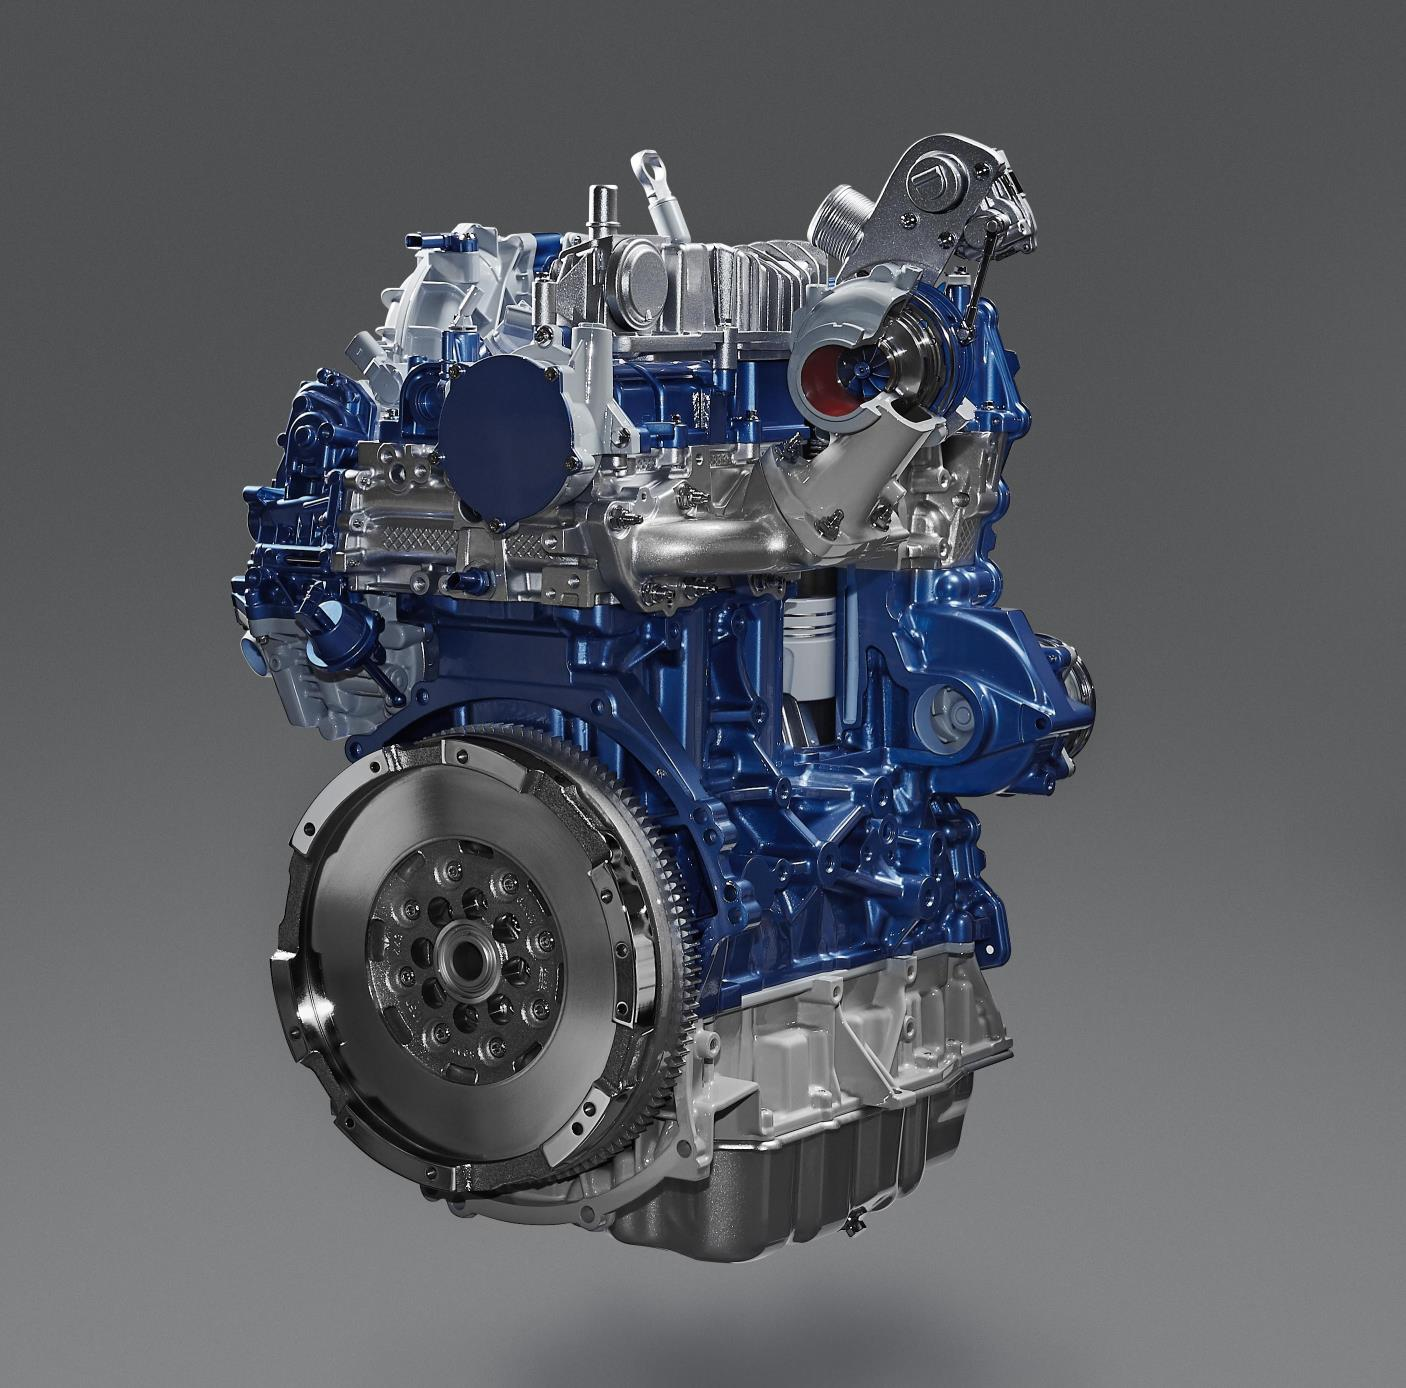 Ford ecoblue diesel engine